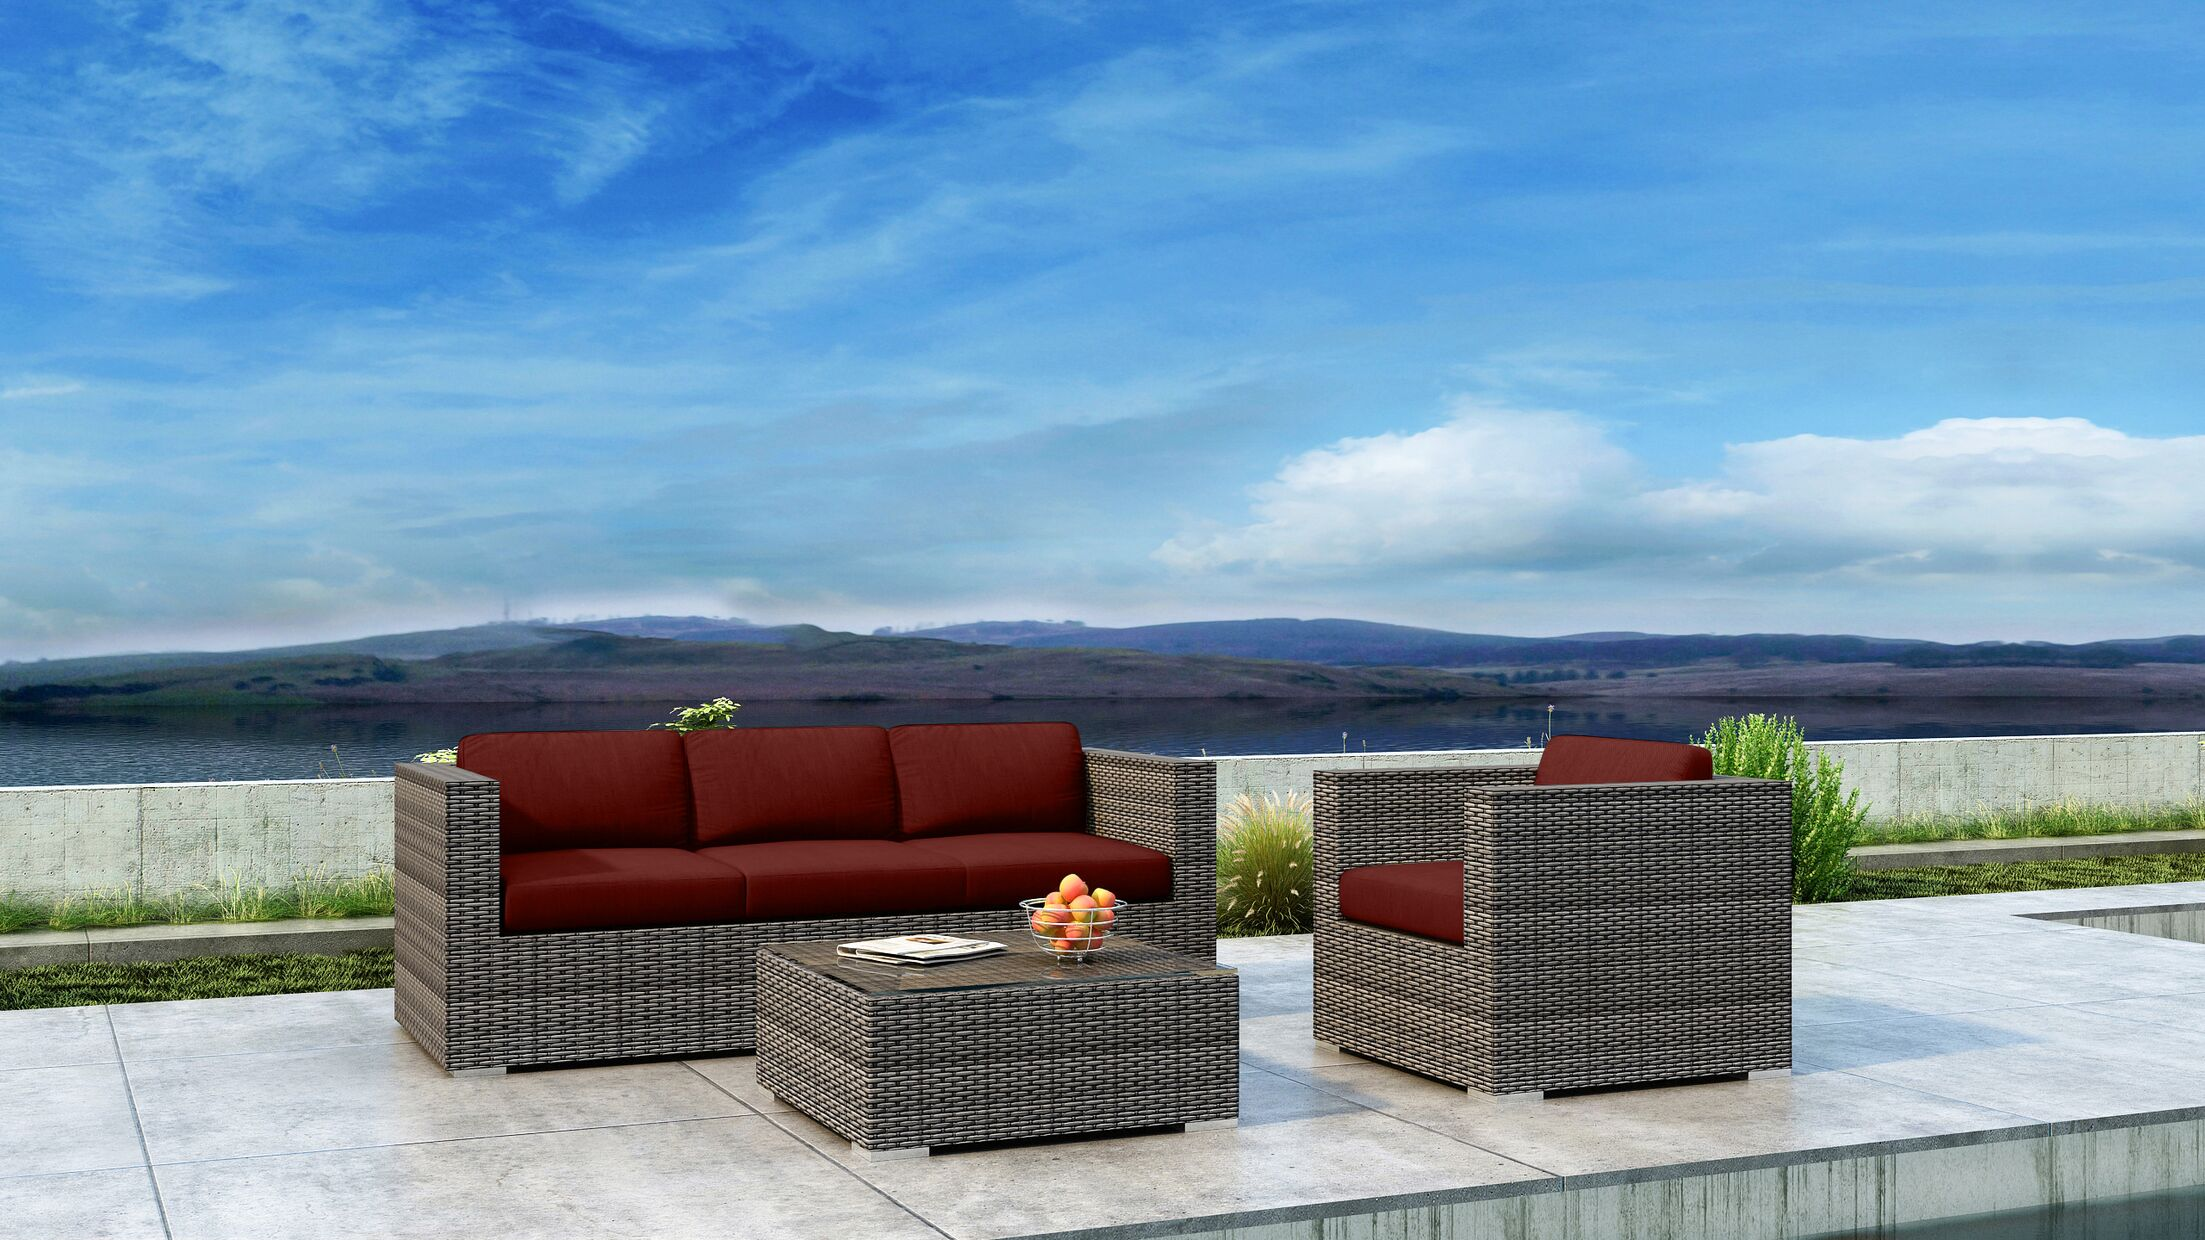 Gilleland 3 Piece Sofa Set with Sunbrella Cushion Cushion Color: Canvas Henna